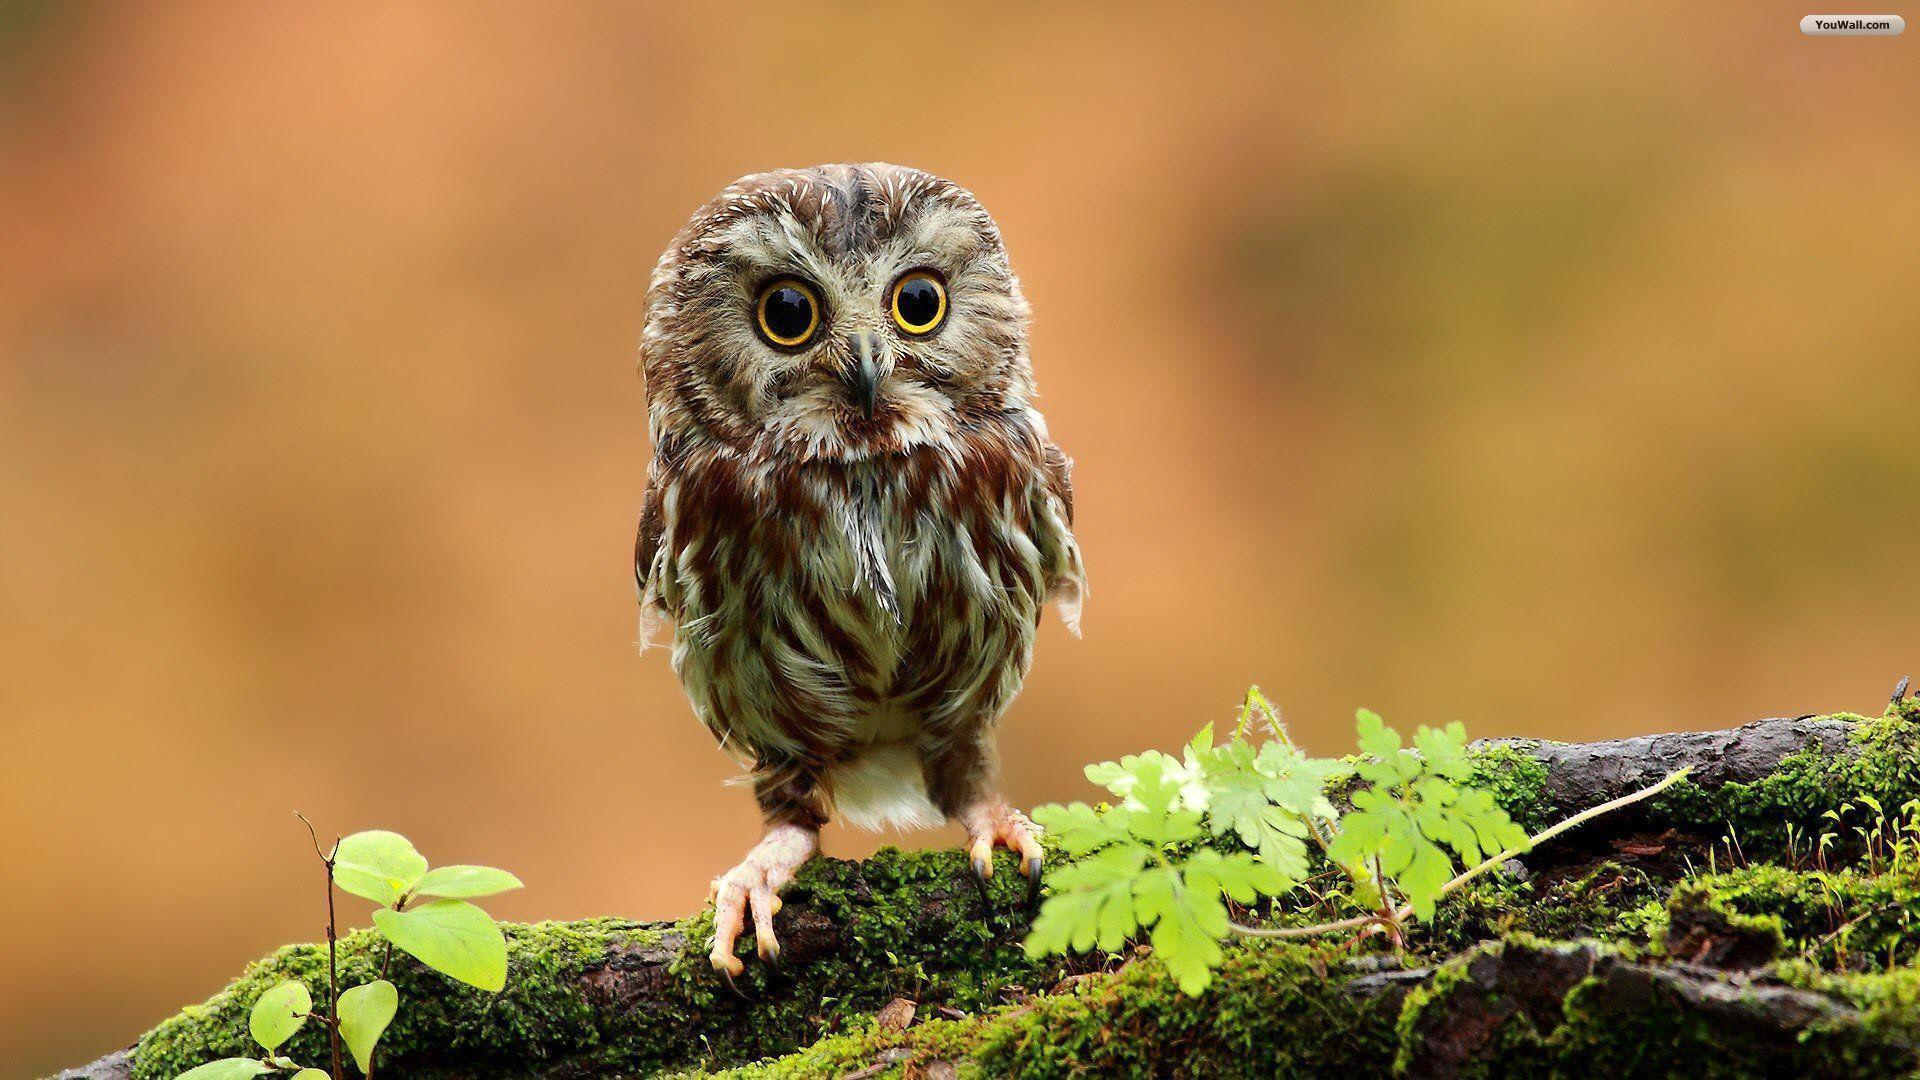 Free Owl Wallpaper 37302 Wallpaper | wallpicsize.